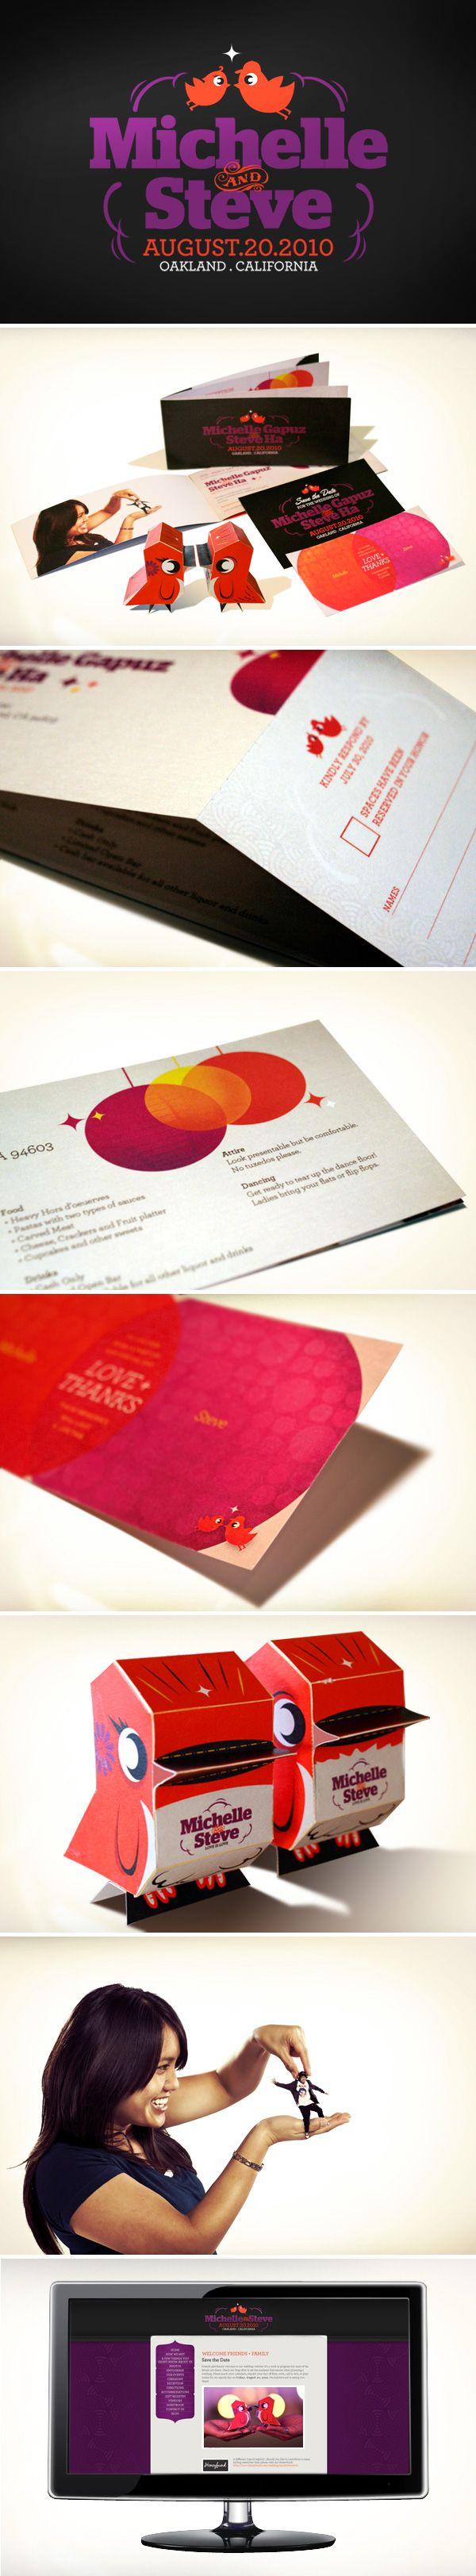 : Design Inspiration, Awesome, Color, Design Ideas, Design Typ, Design Branding, Wedding Design, 00 Design, Design Amusement